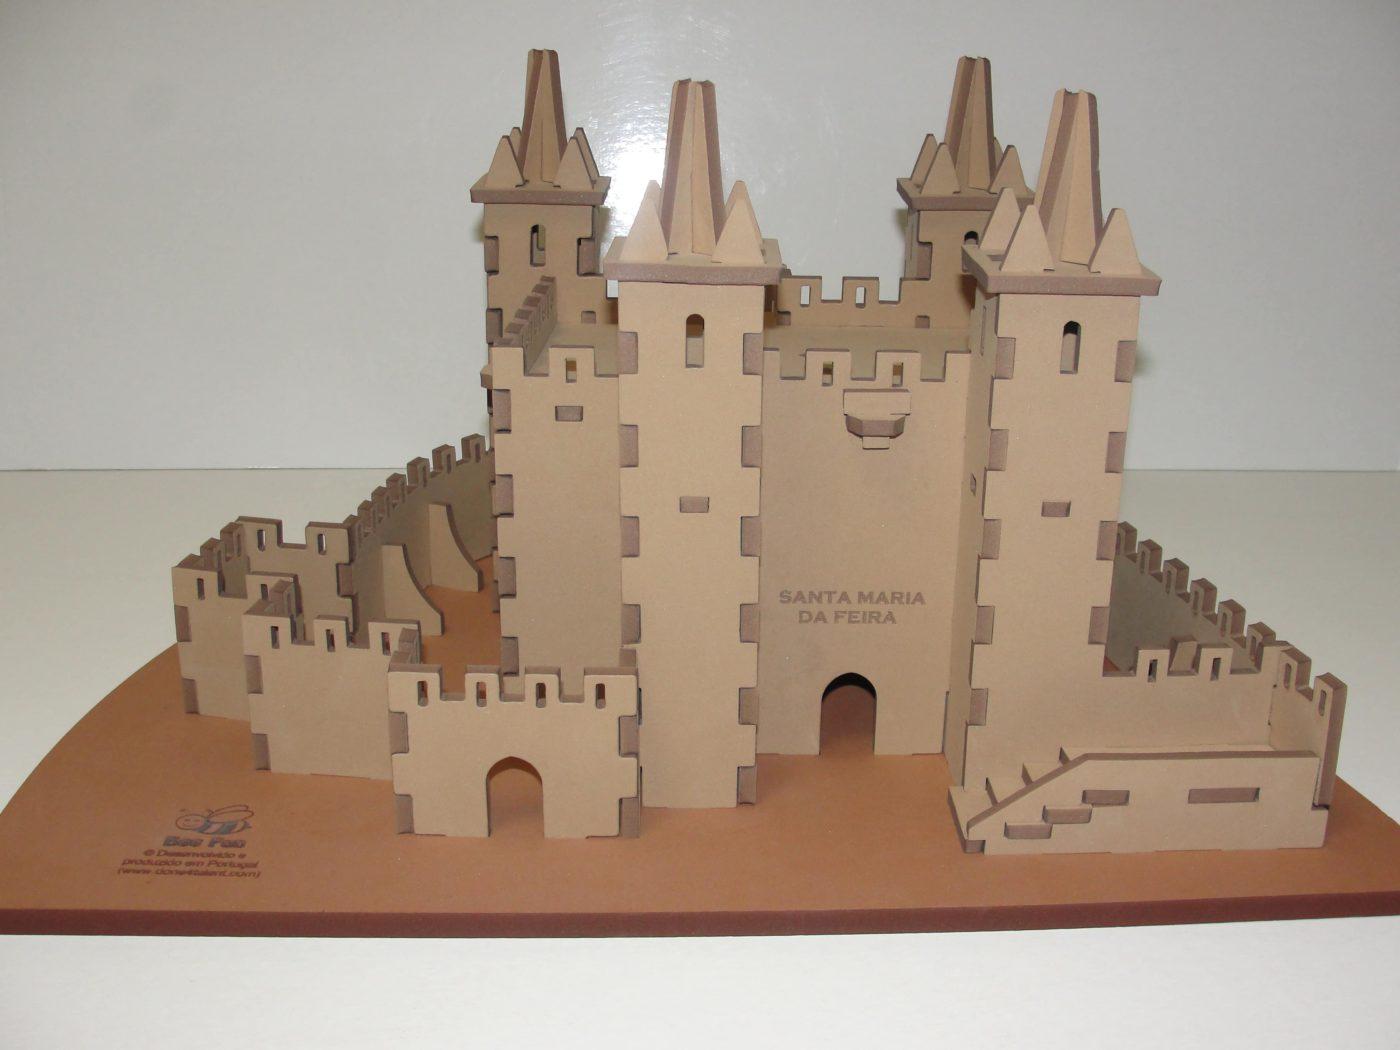 CasteloSantaMariaFeiraPuzzle3D1